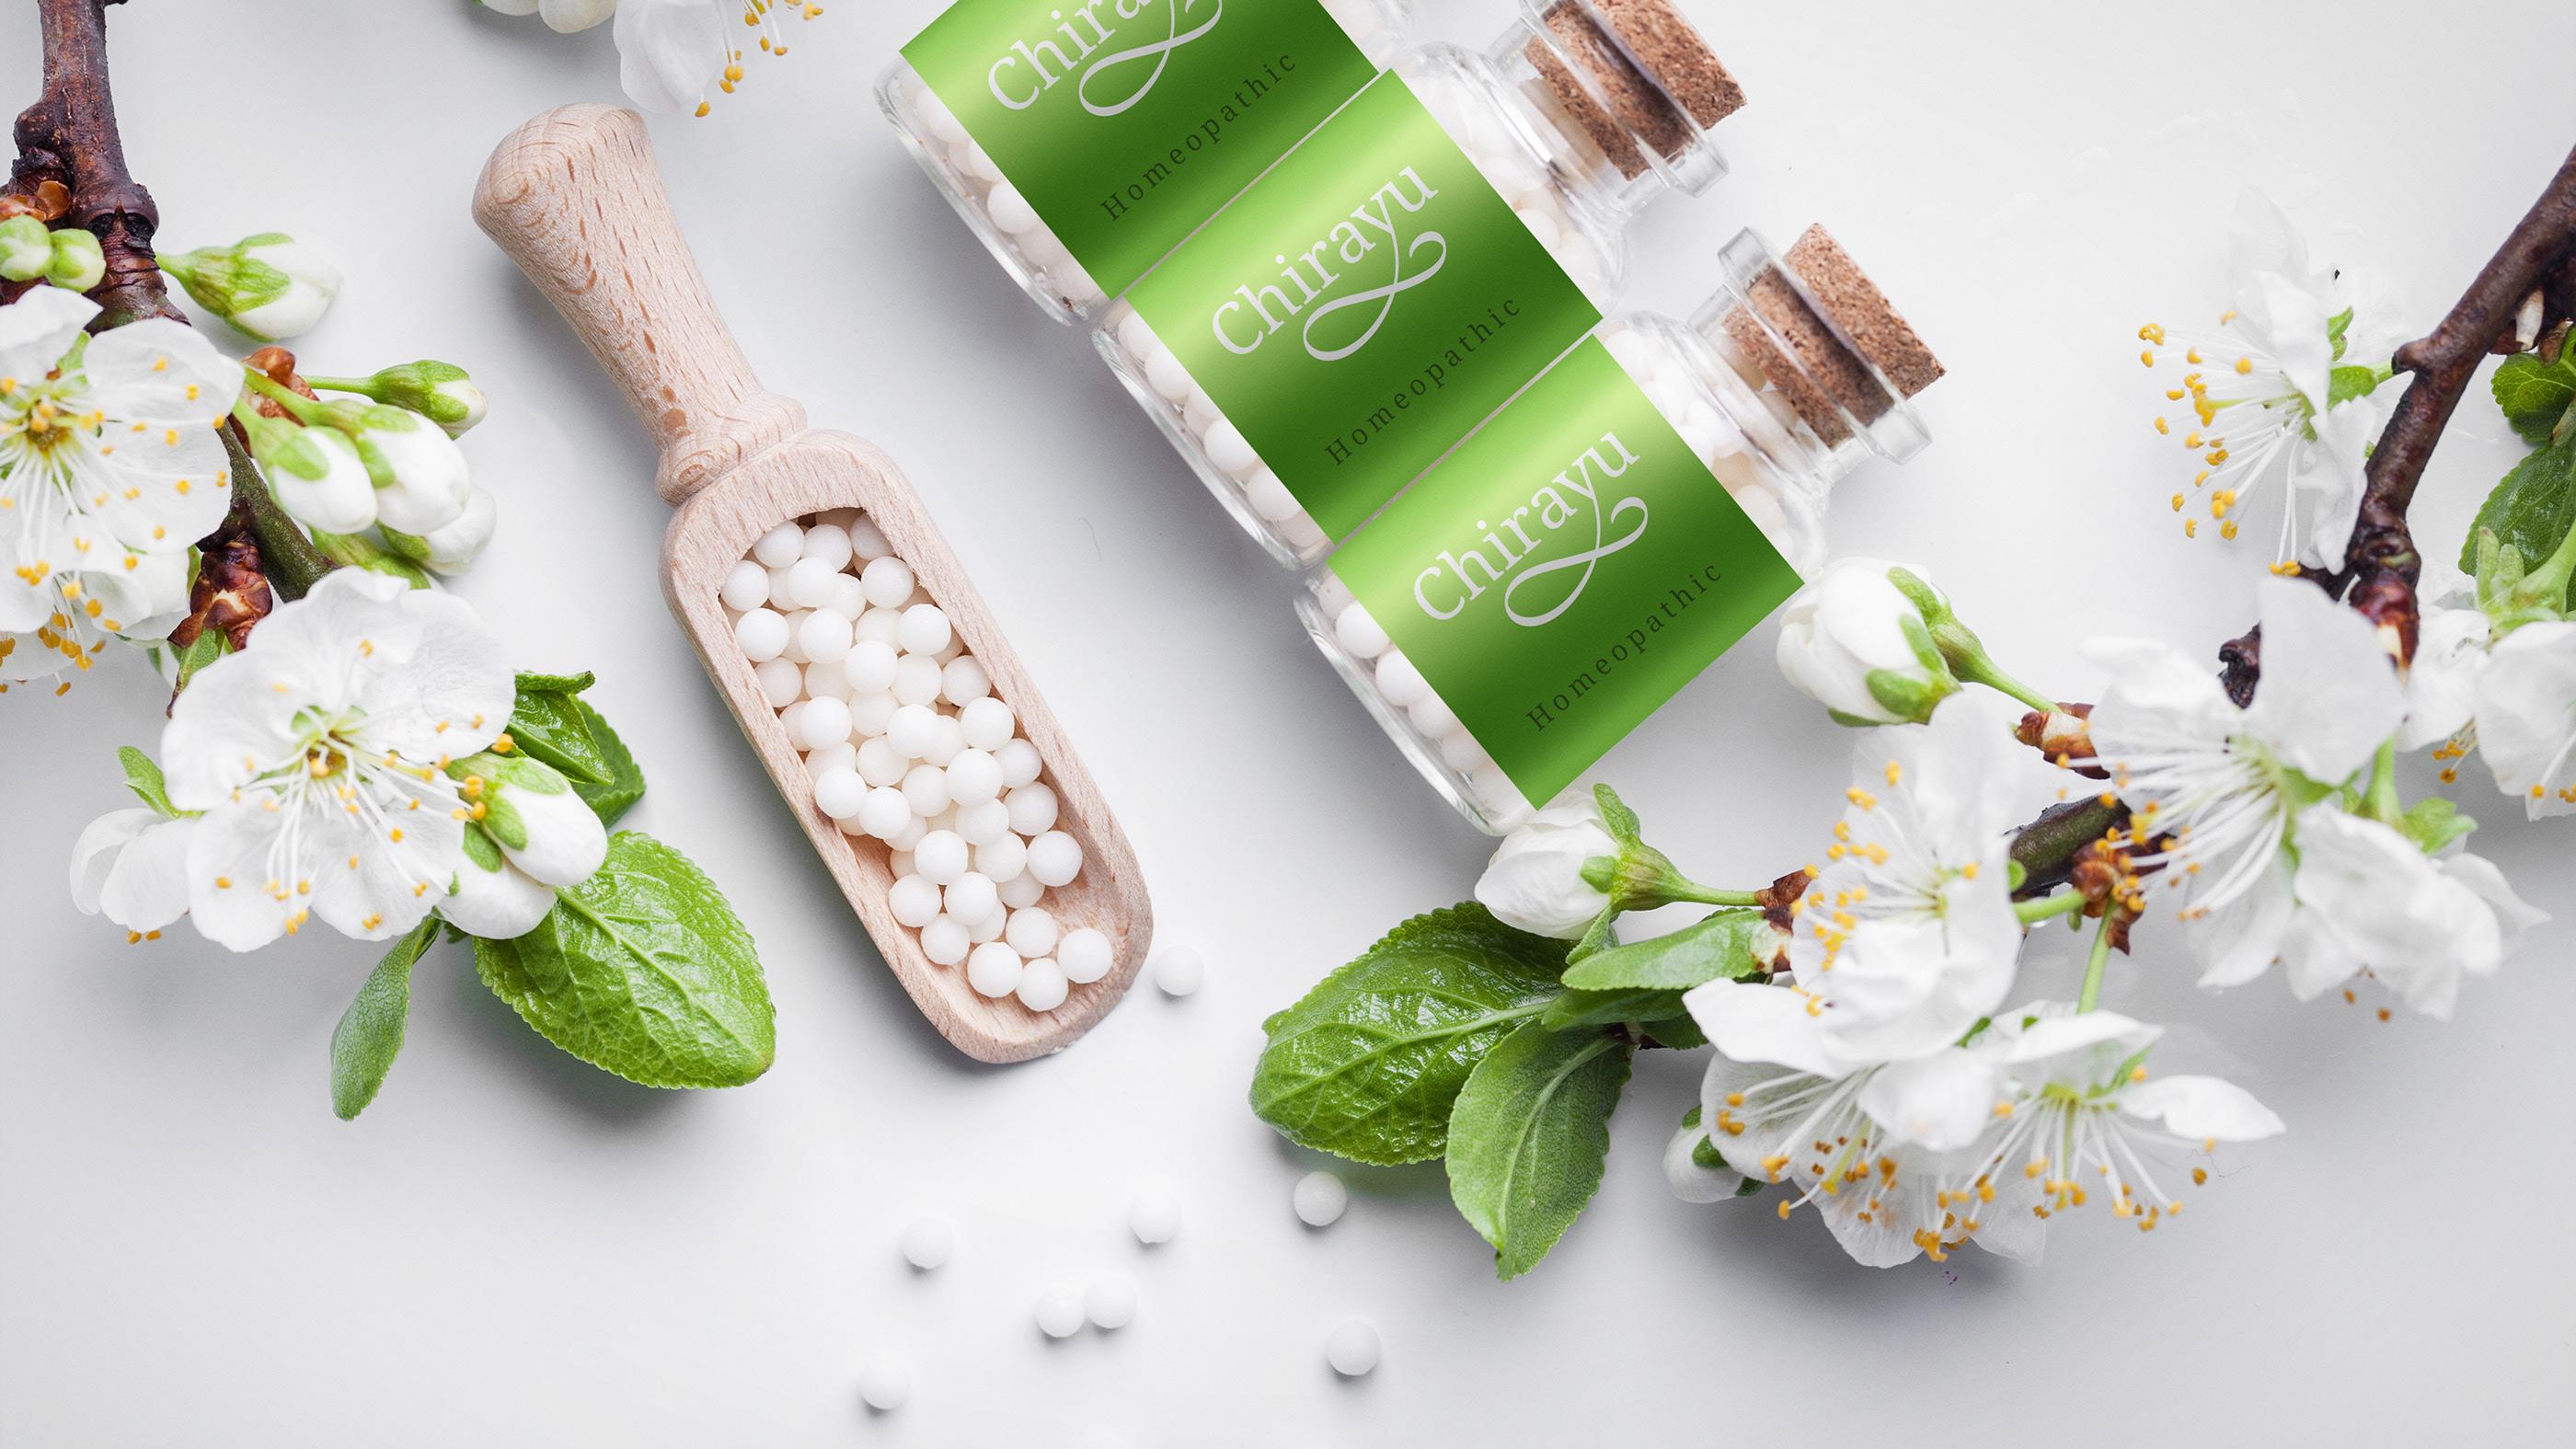 Chirayu Homeopathic Clinic on Behance